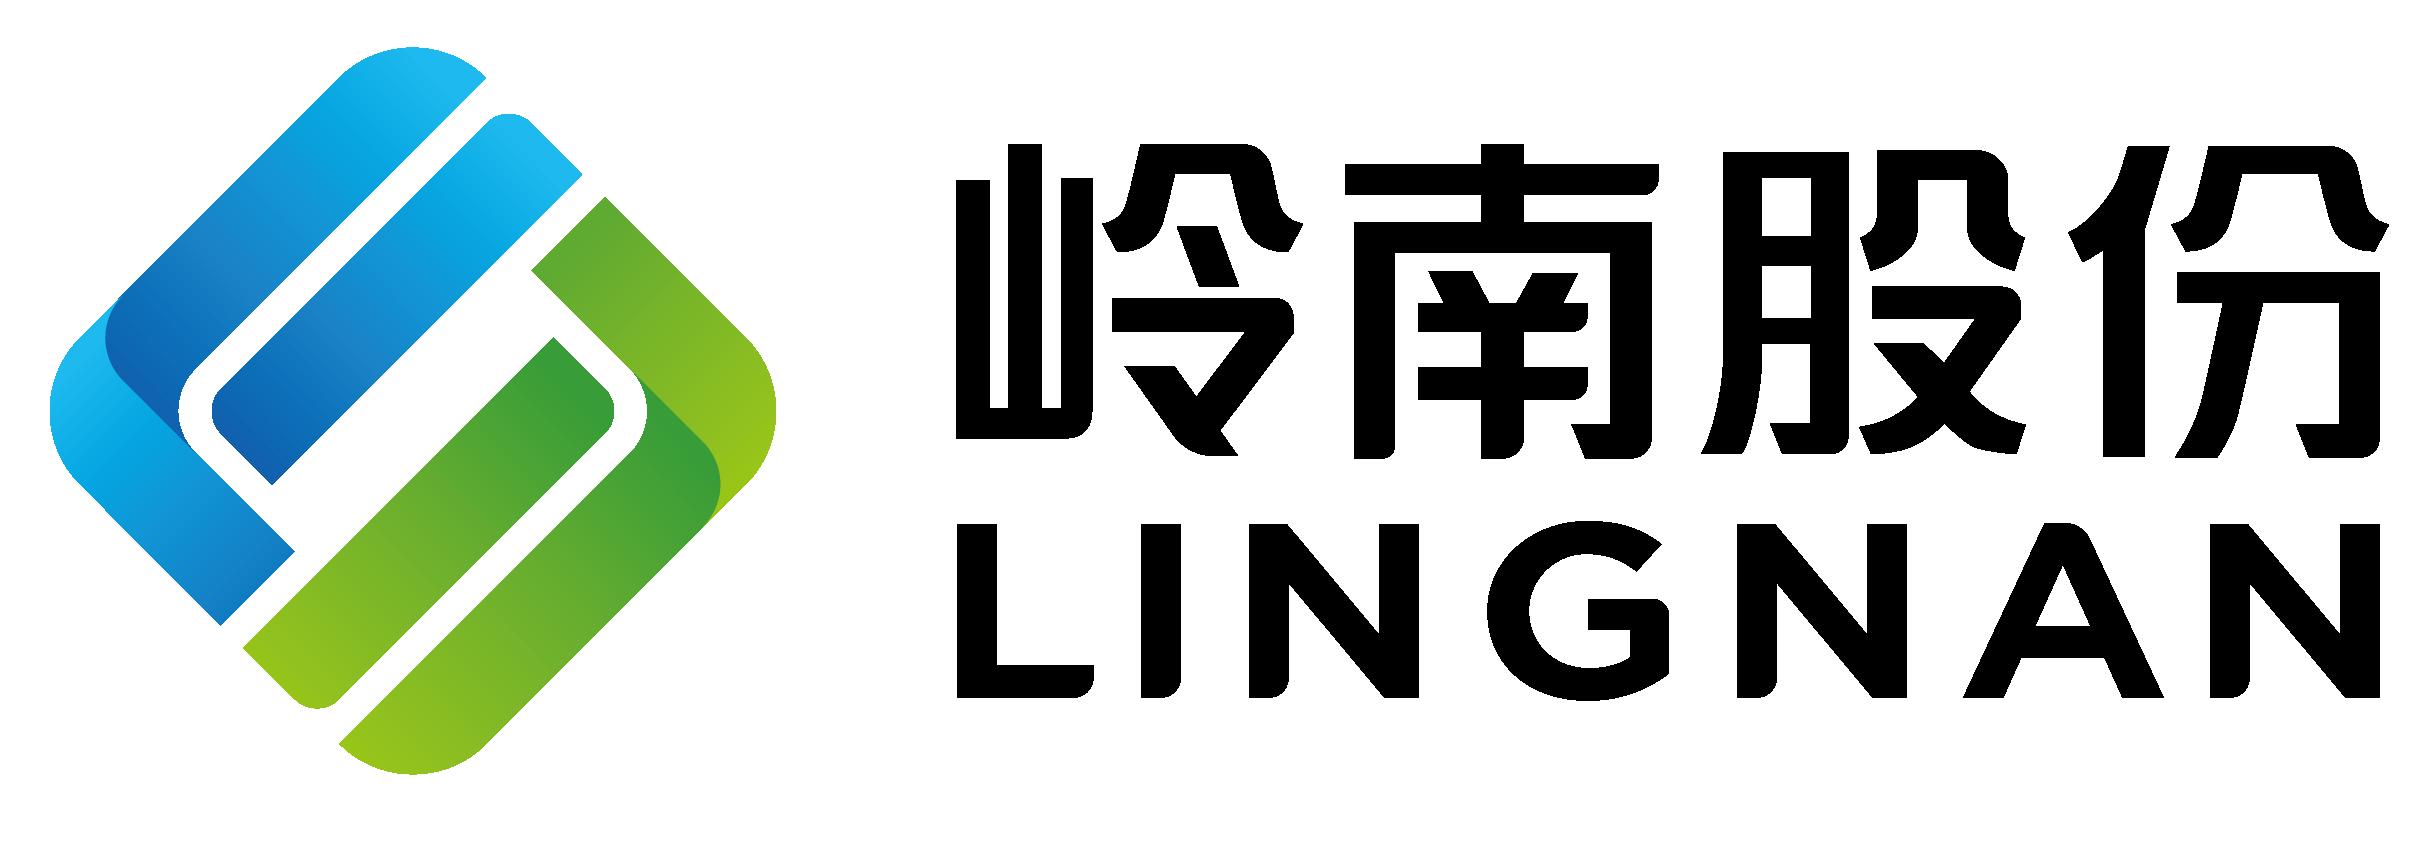 raybet欧洲雷竞技app用不了-中英简称组合-01.png